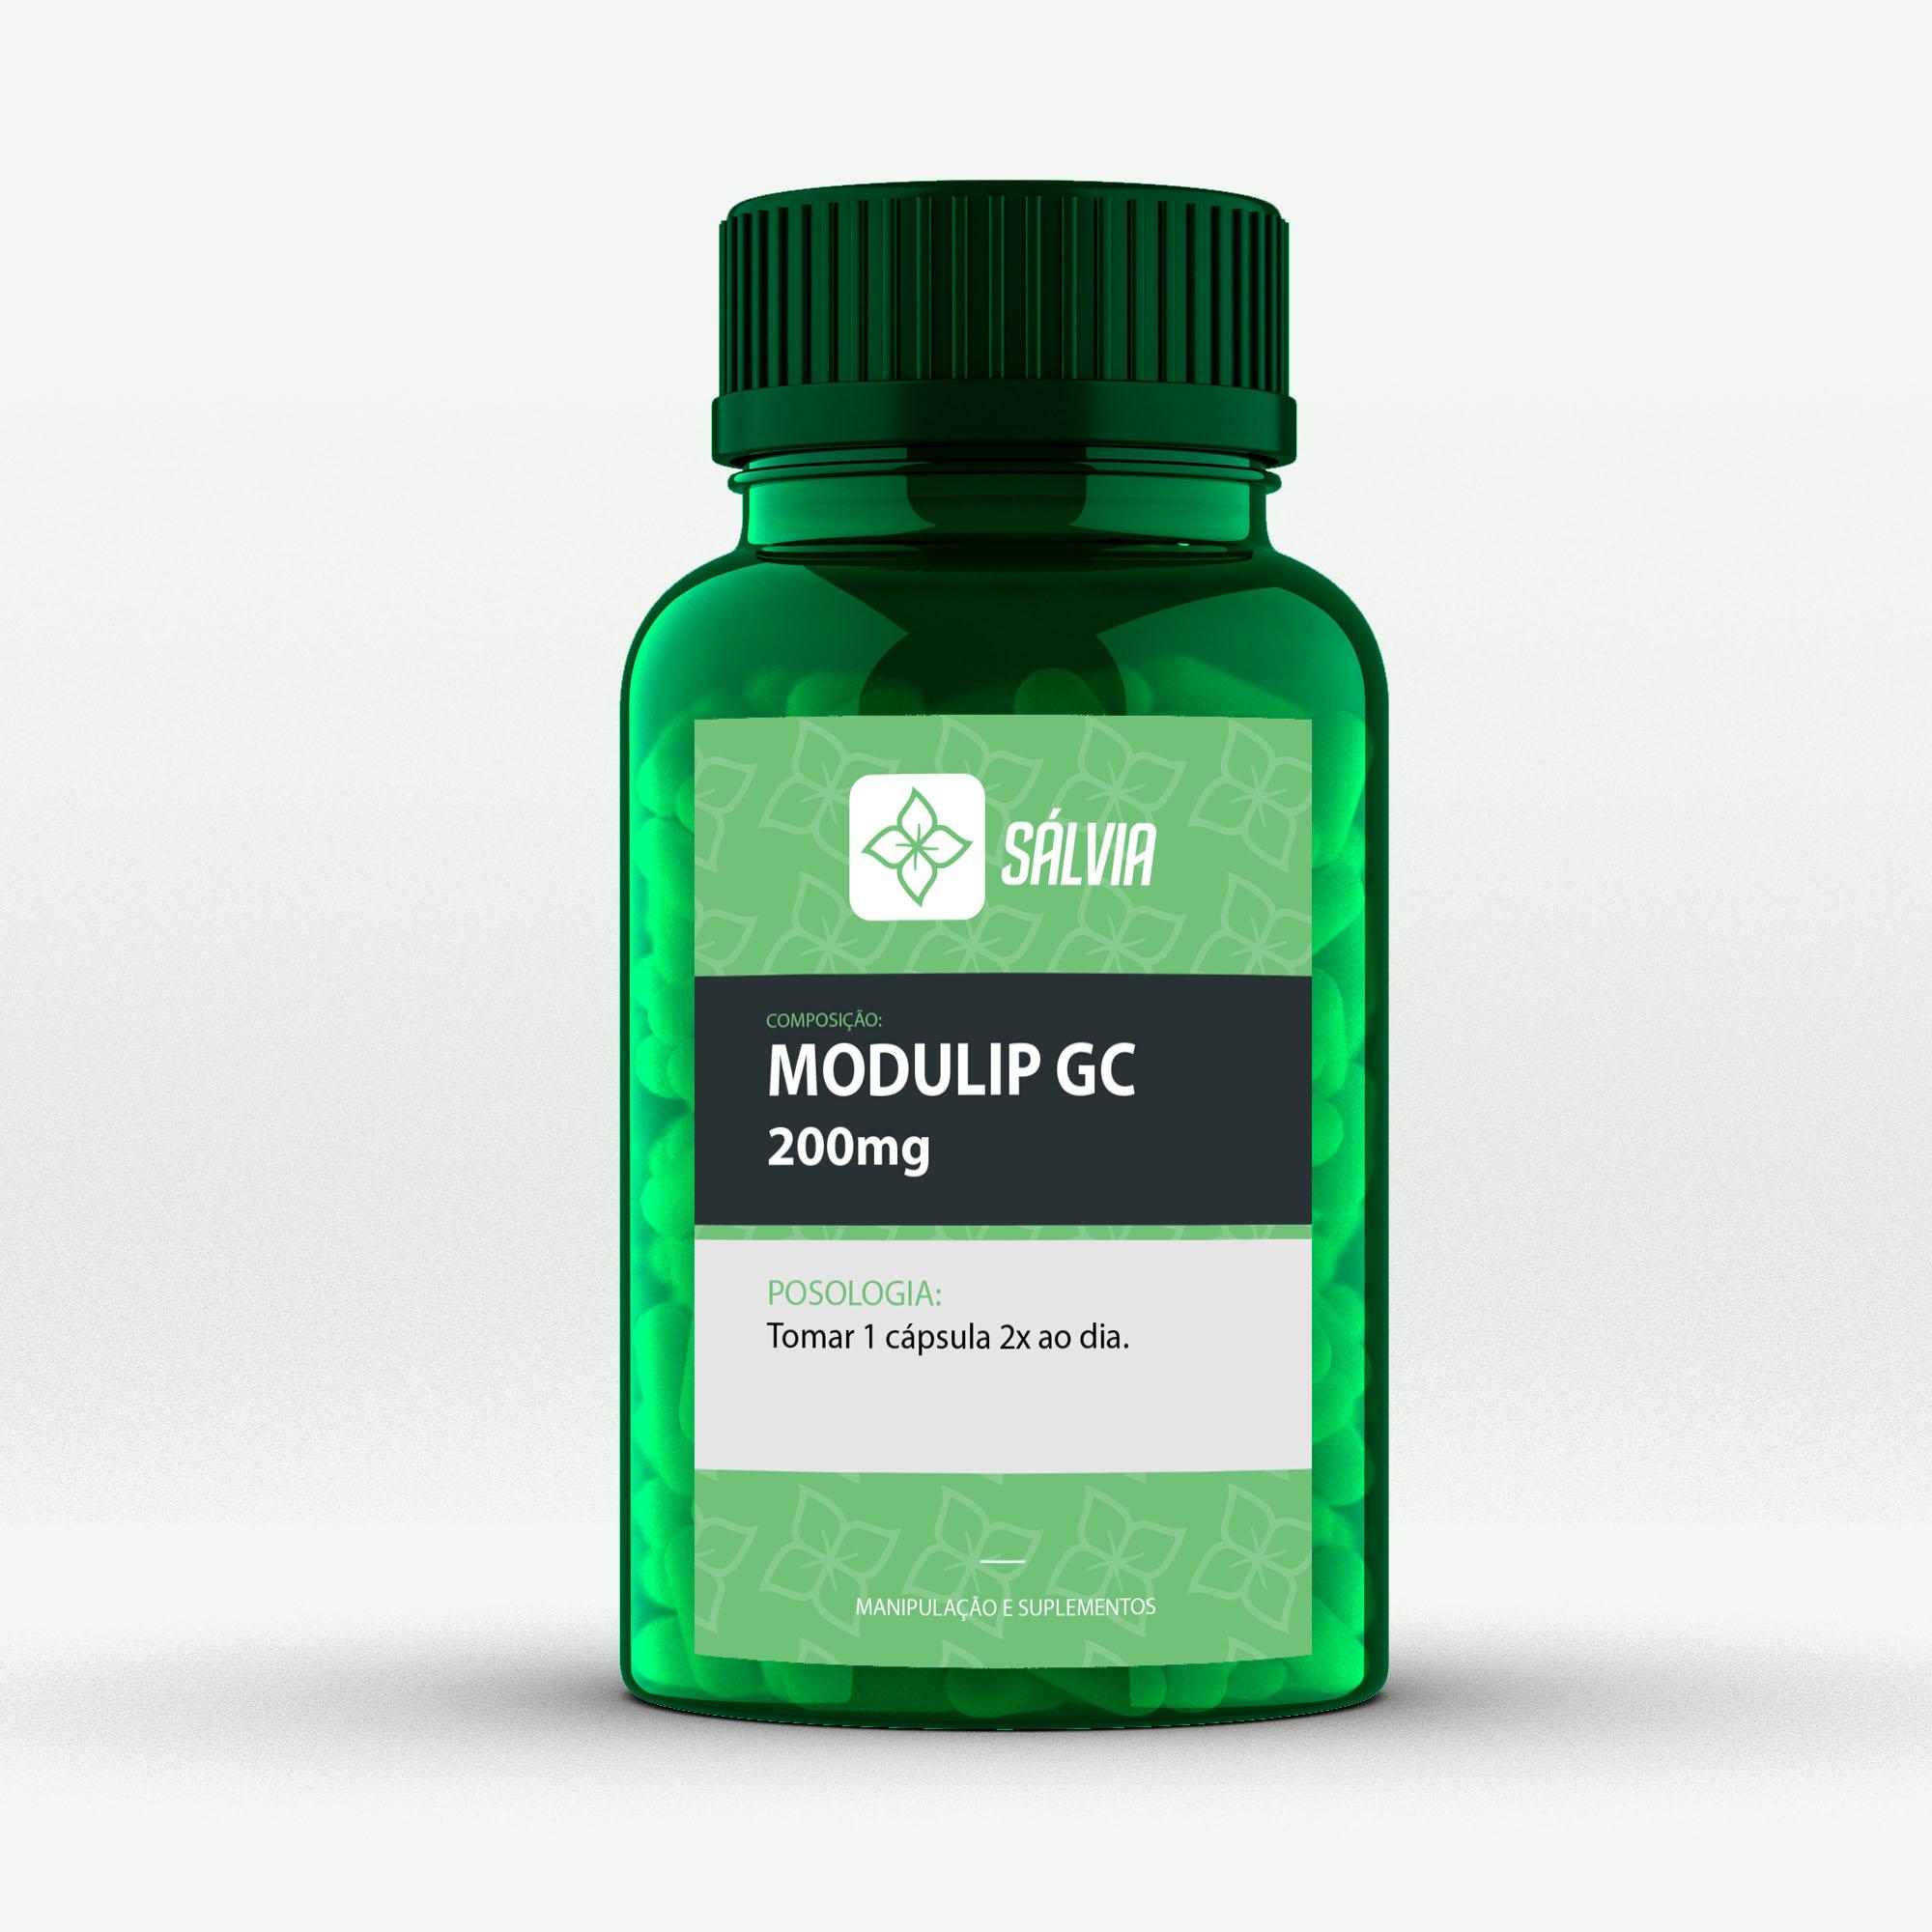 MODULIP GC 200mg - Cápsulas